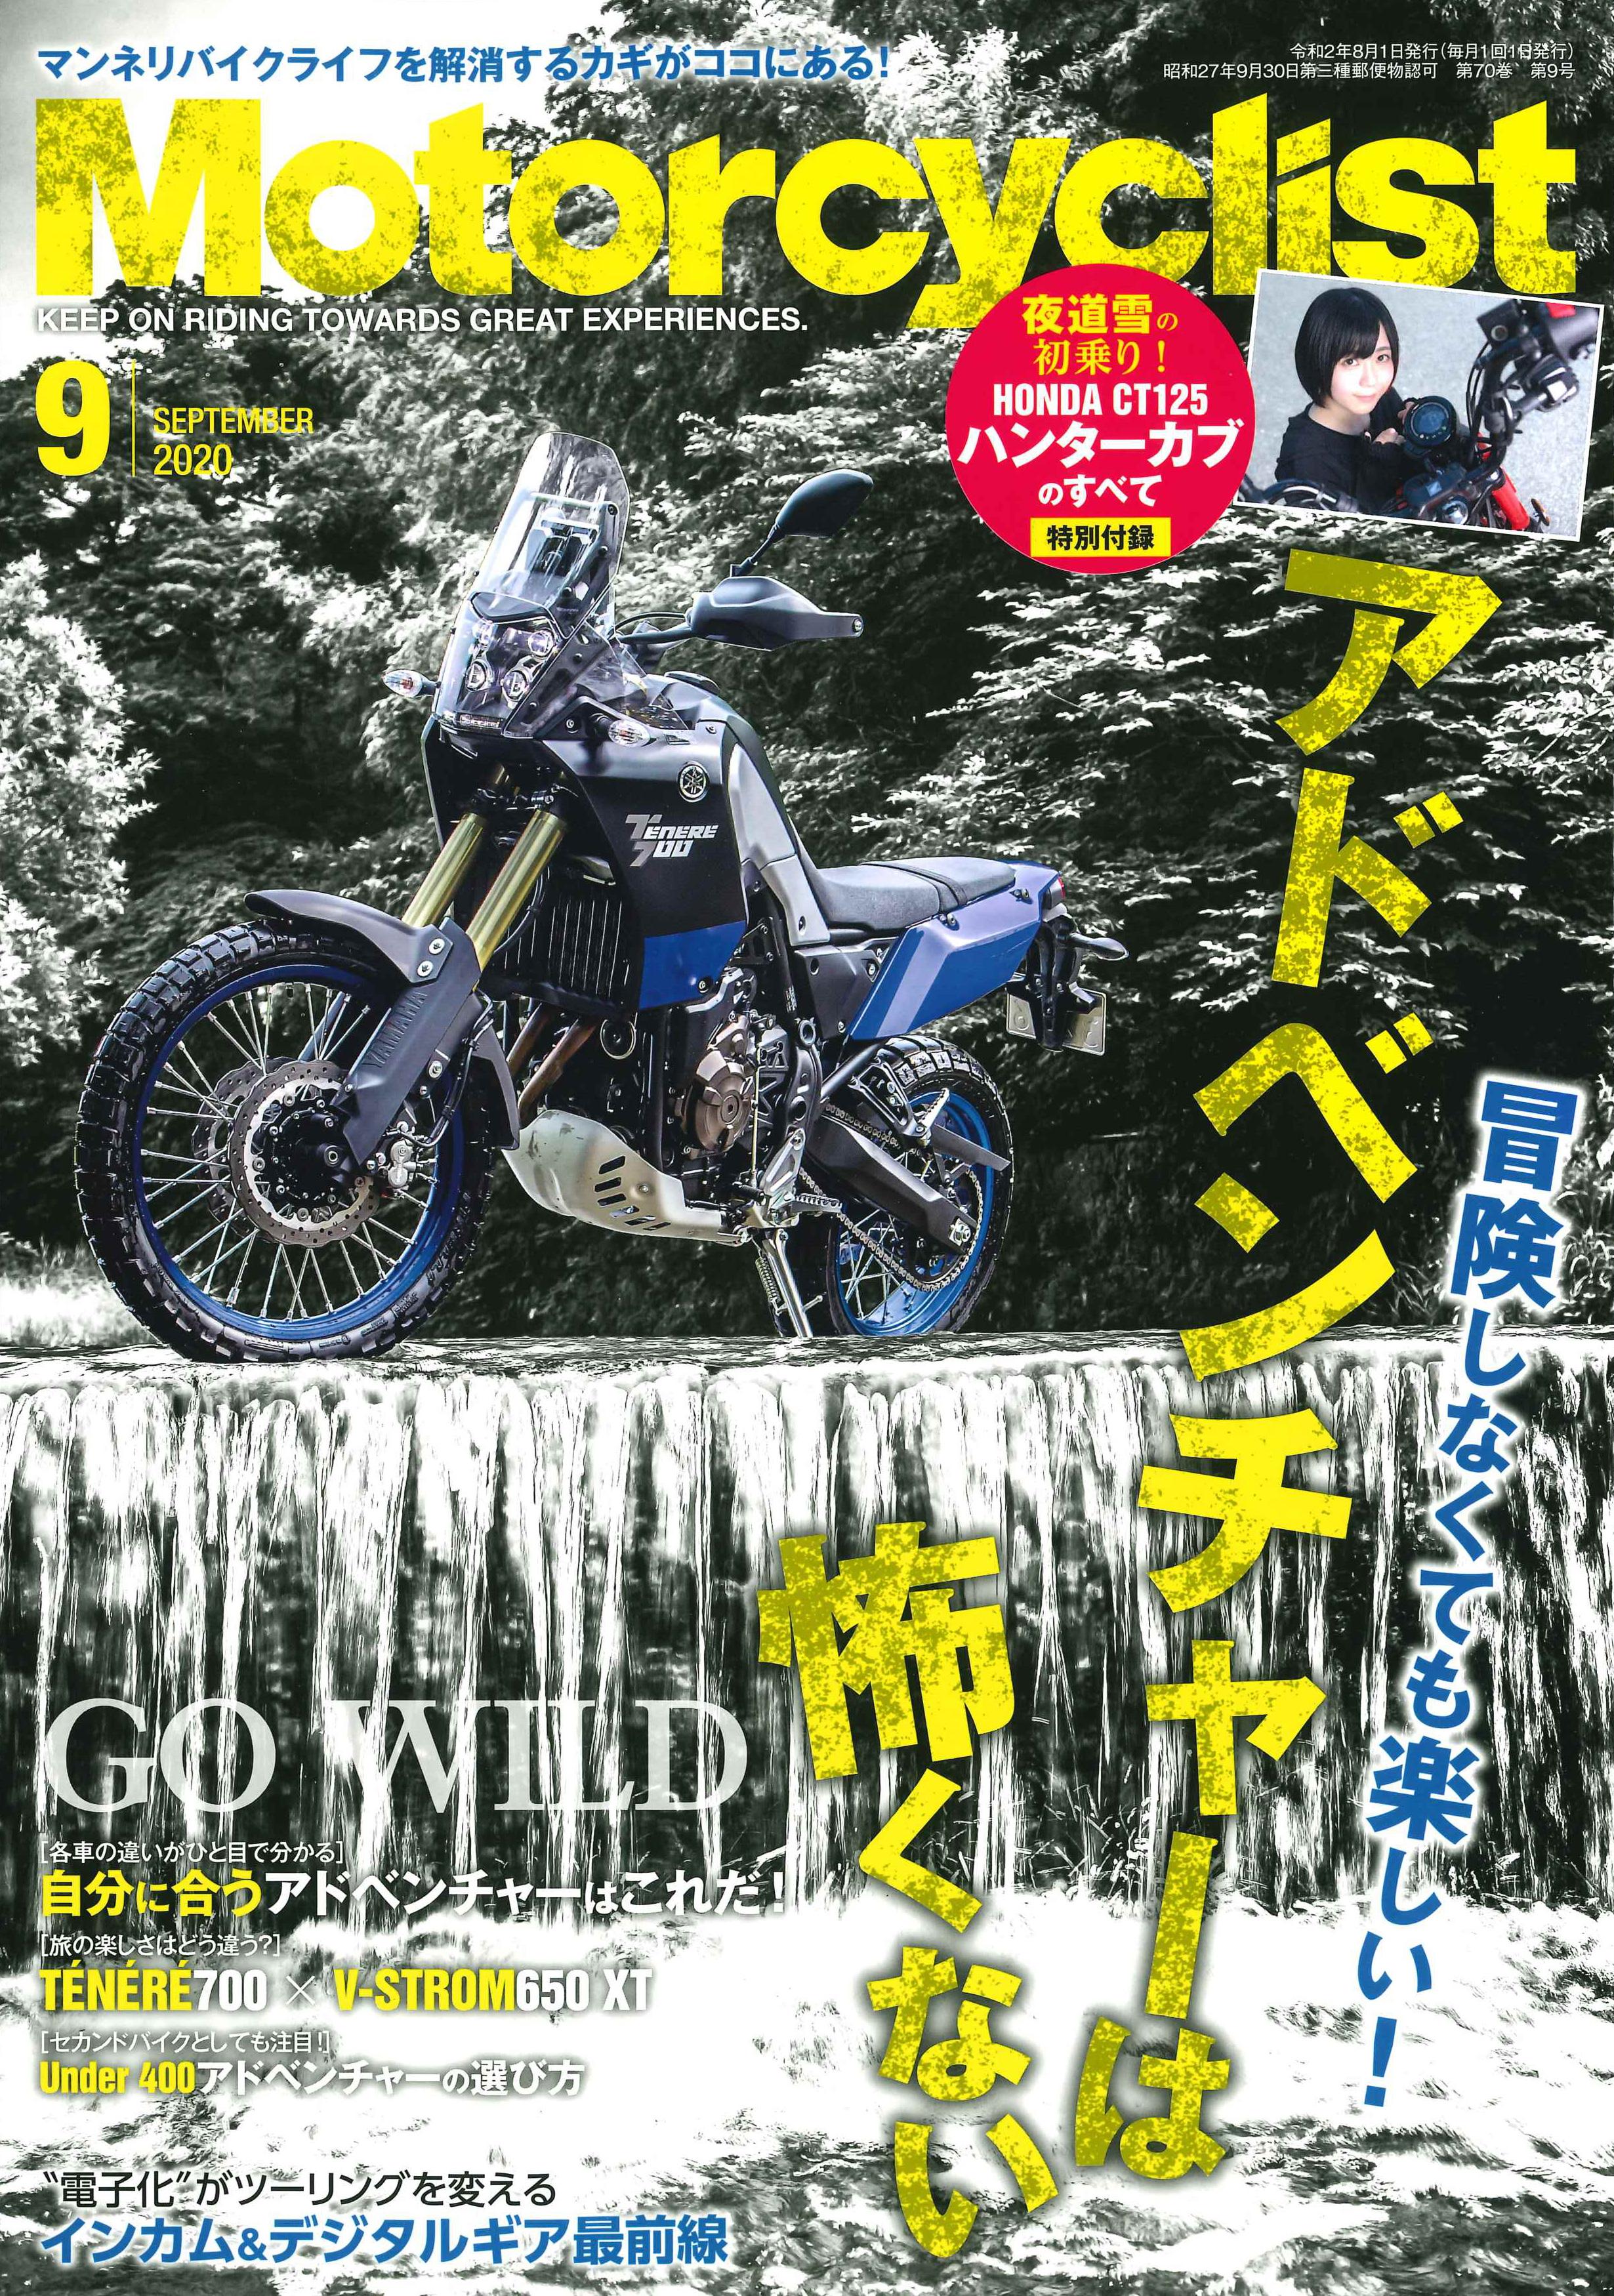 【Motorcyclist 9月号】『B+COM ONE / SB6X』